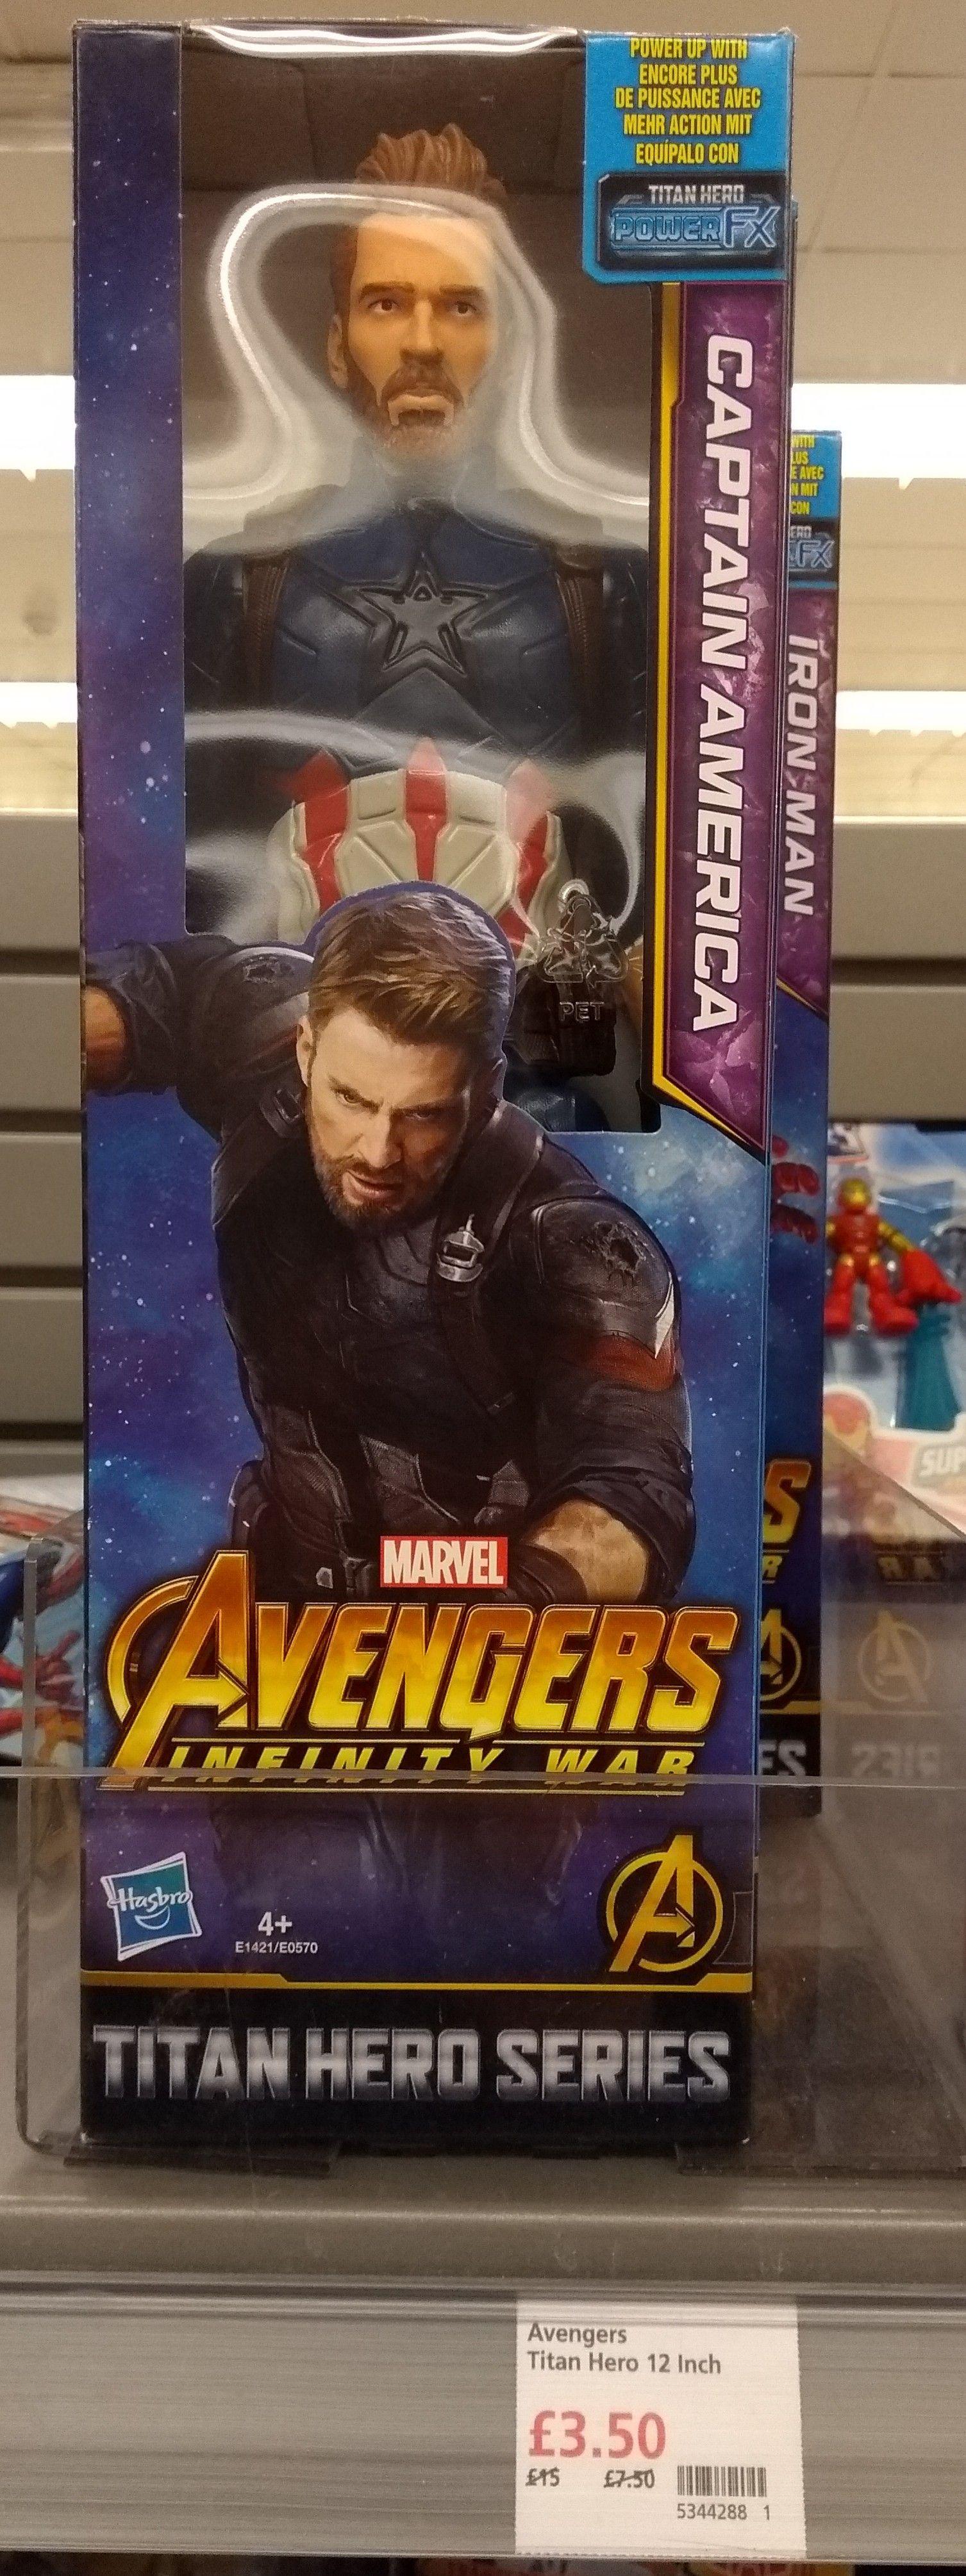 "Marvel Avengers Infinity War Titan Hero 12"" Action Figures in-store at Waitrose, Willerby, East Yorkshire - £3.50"